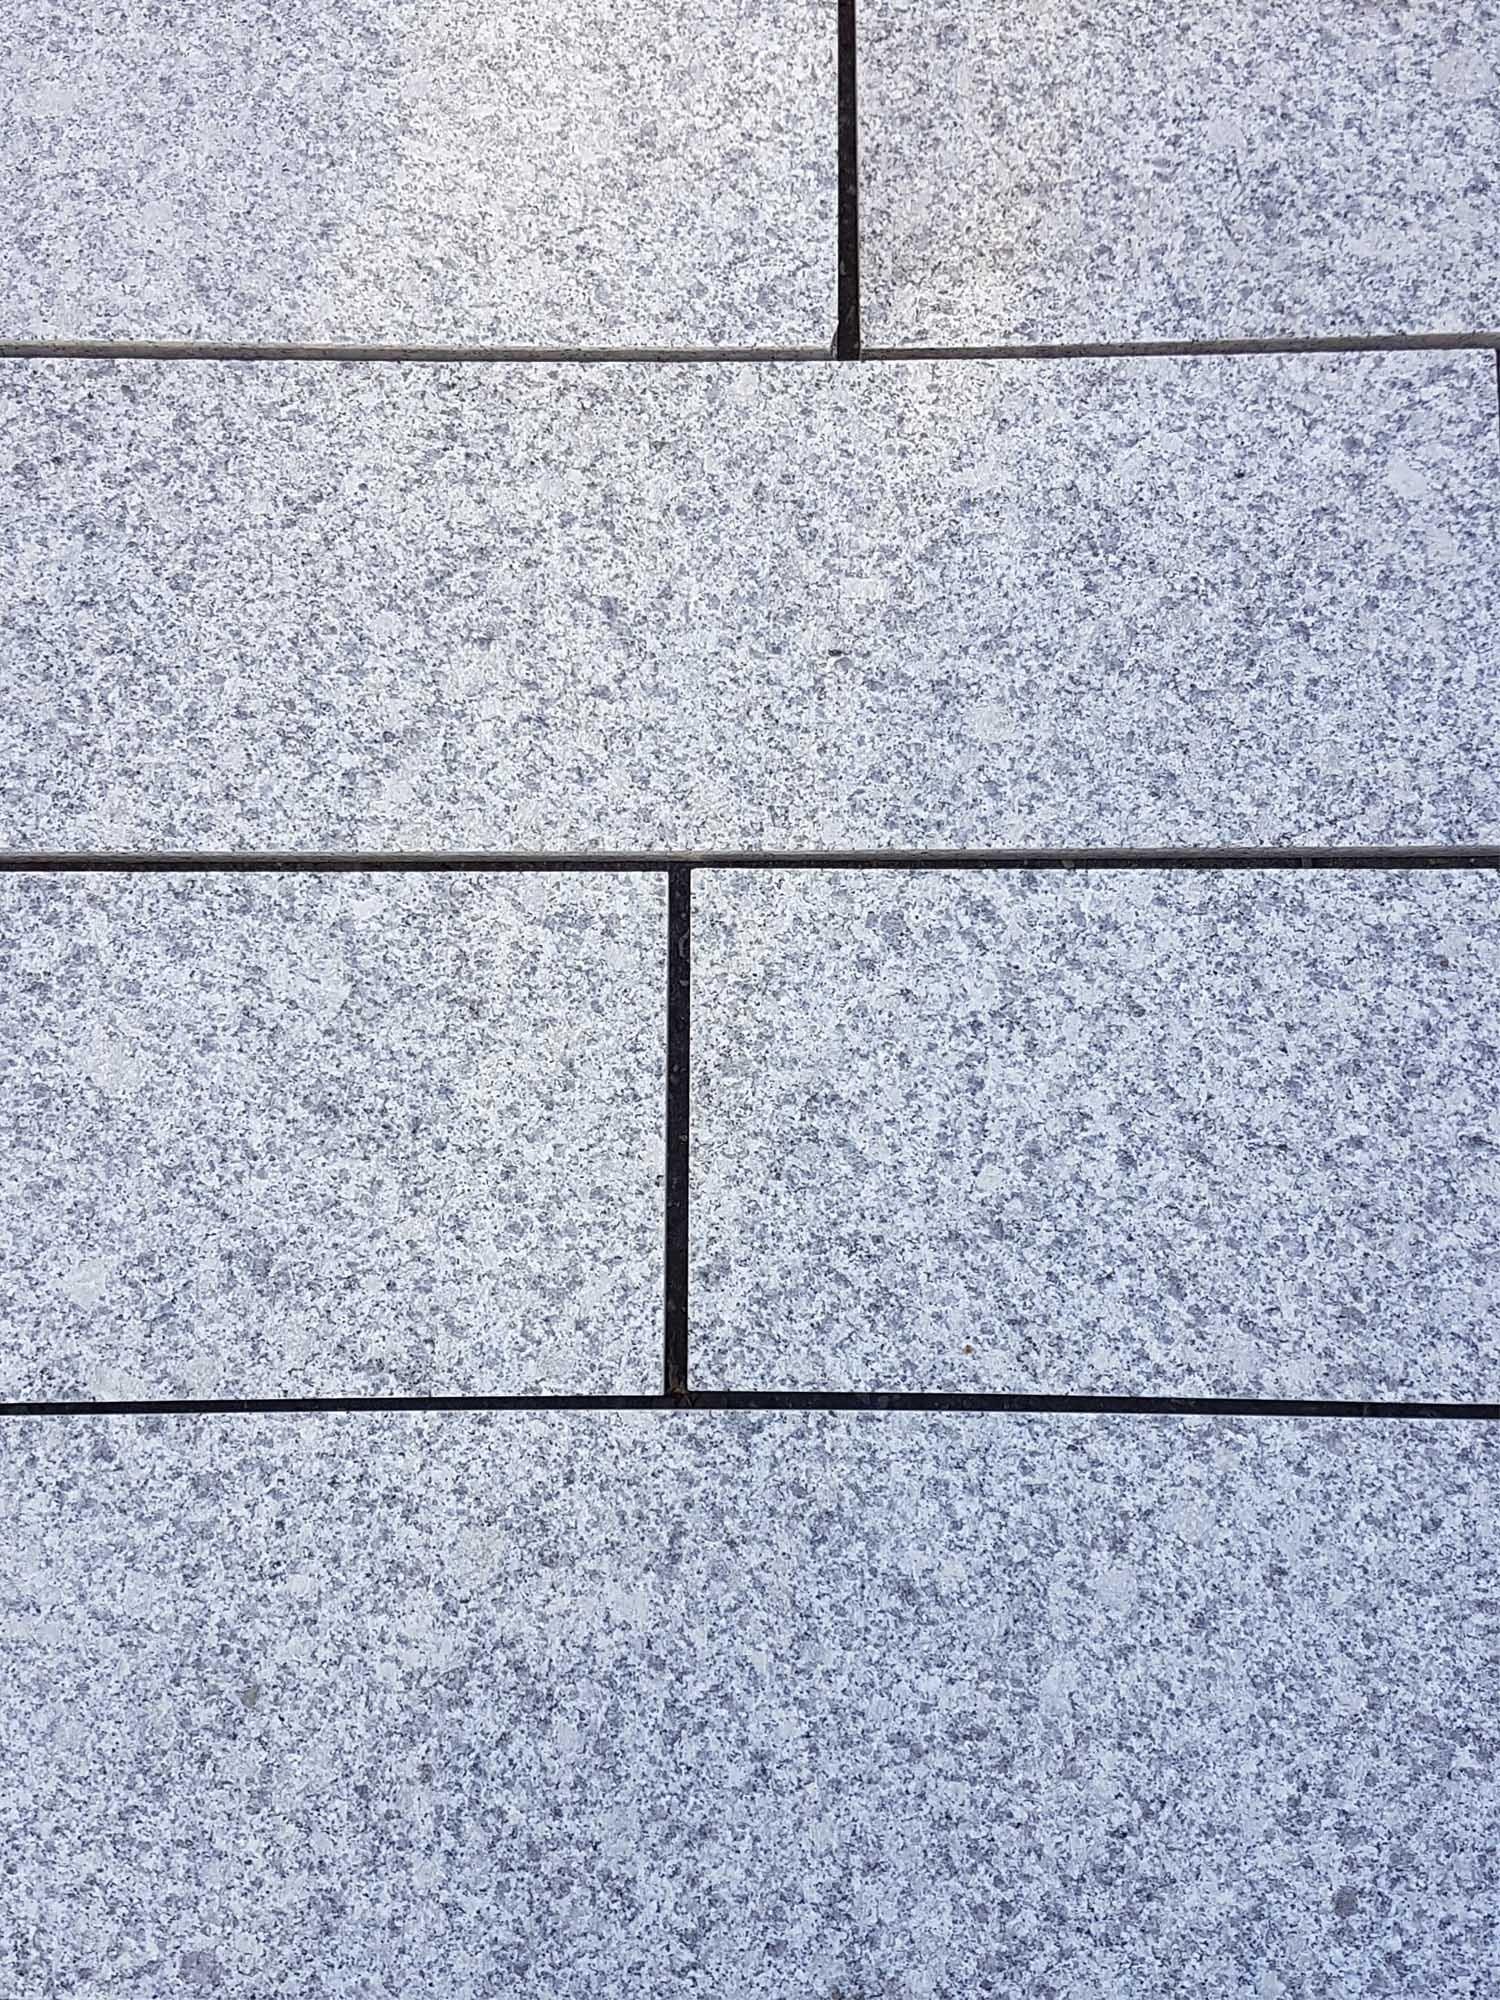 Light Grey Granite Paving Slabs Silver Grey Granite